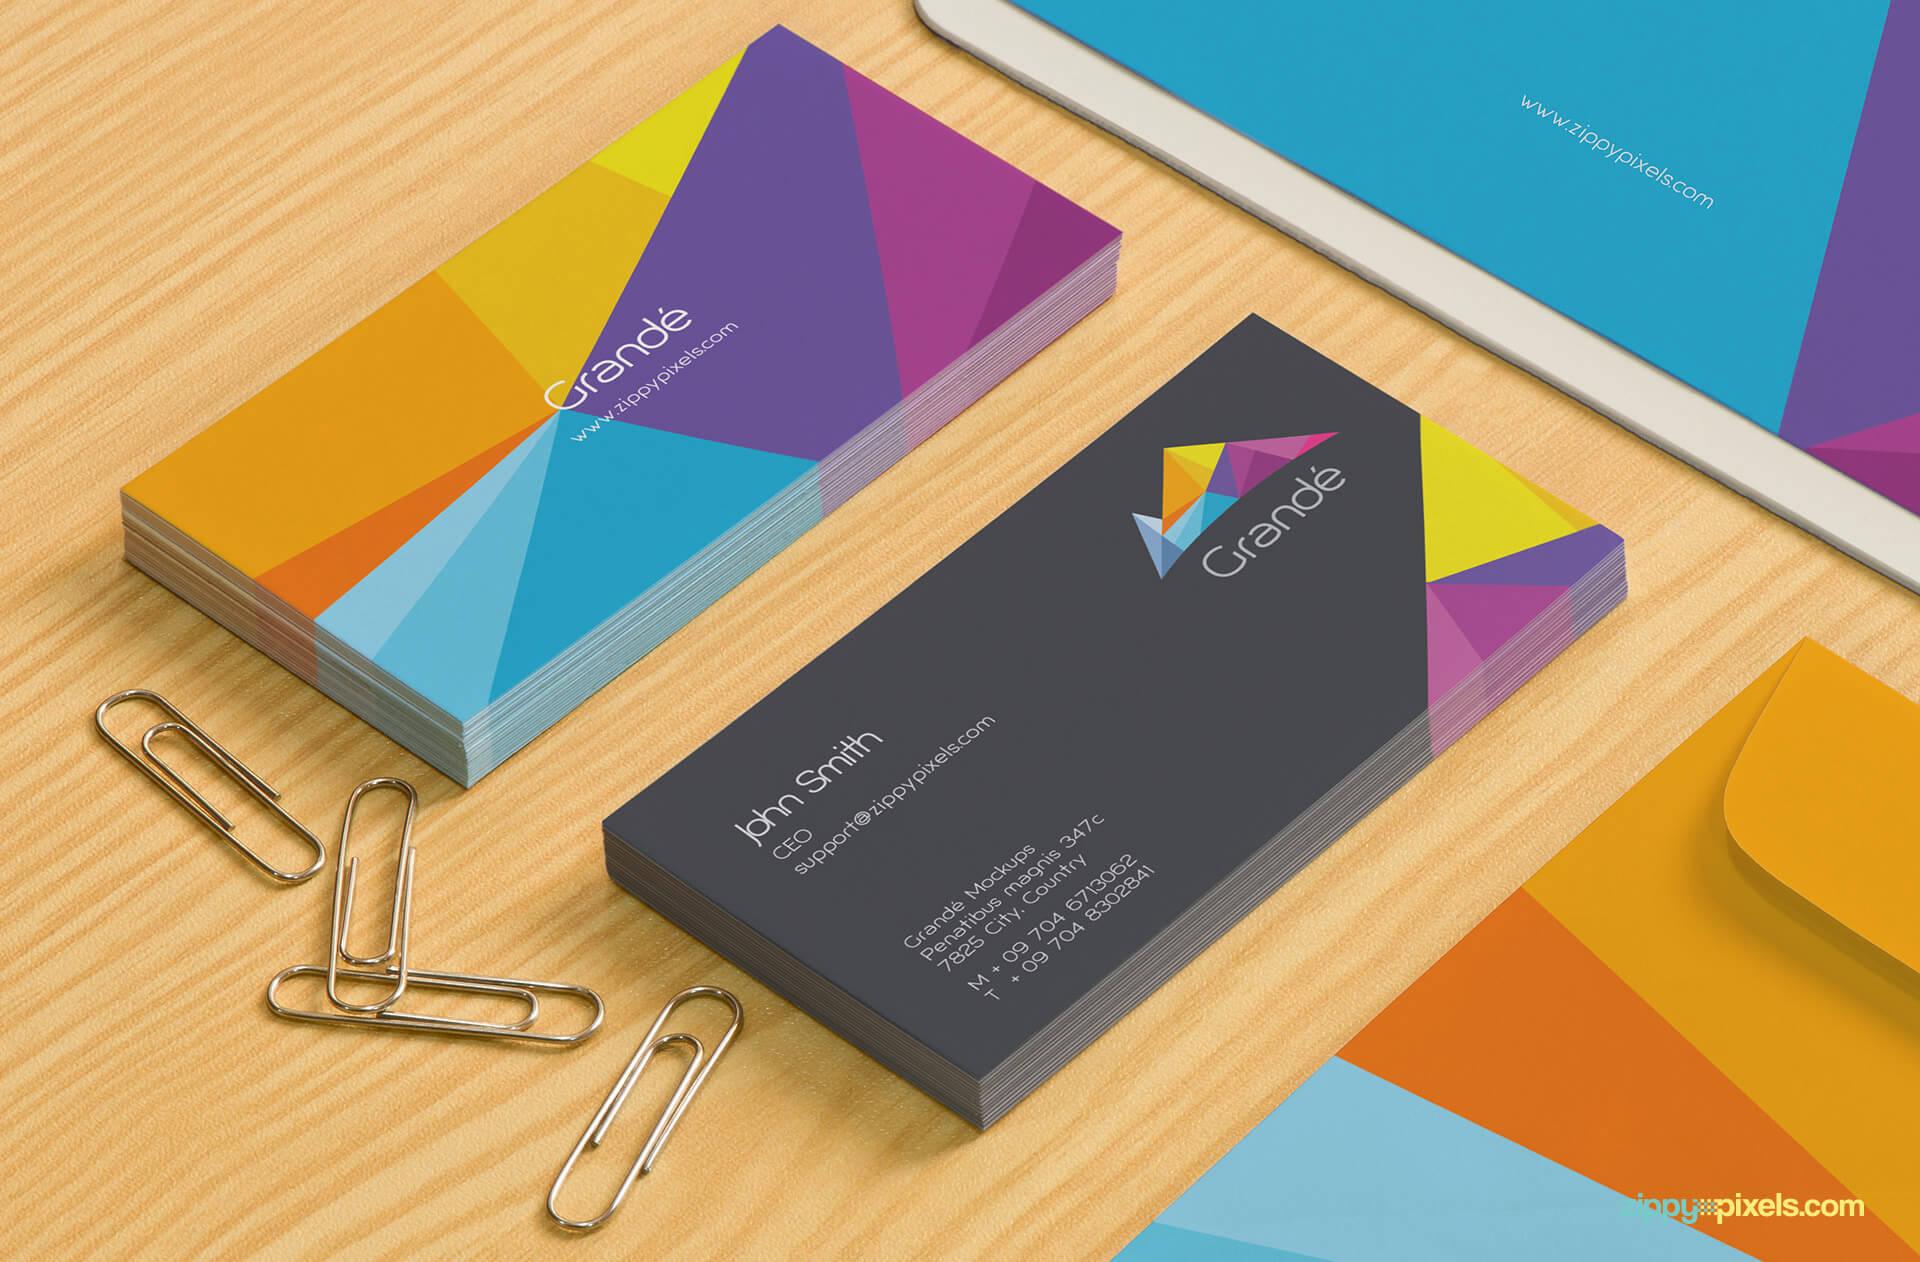 Close up shot of Business Card Mockup